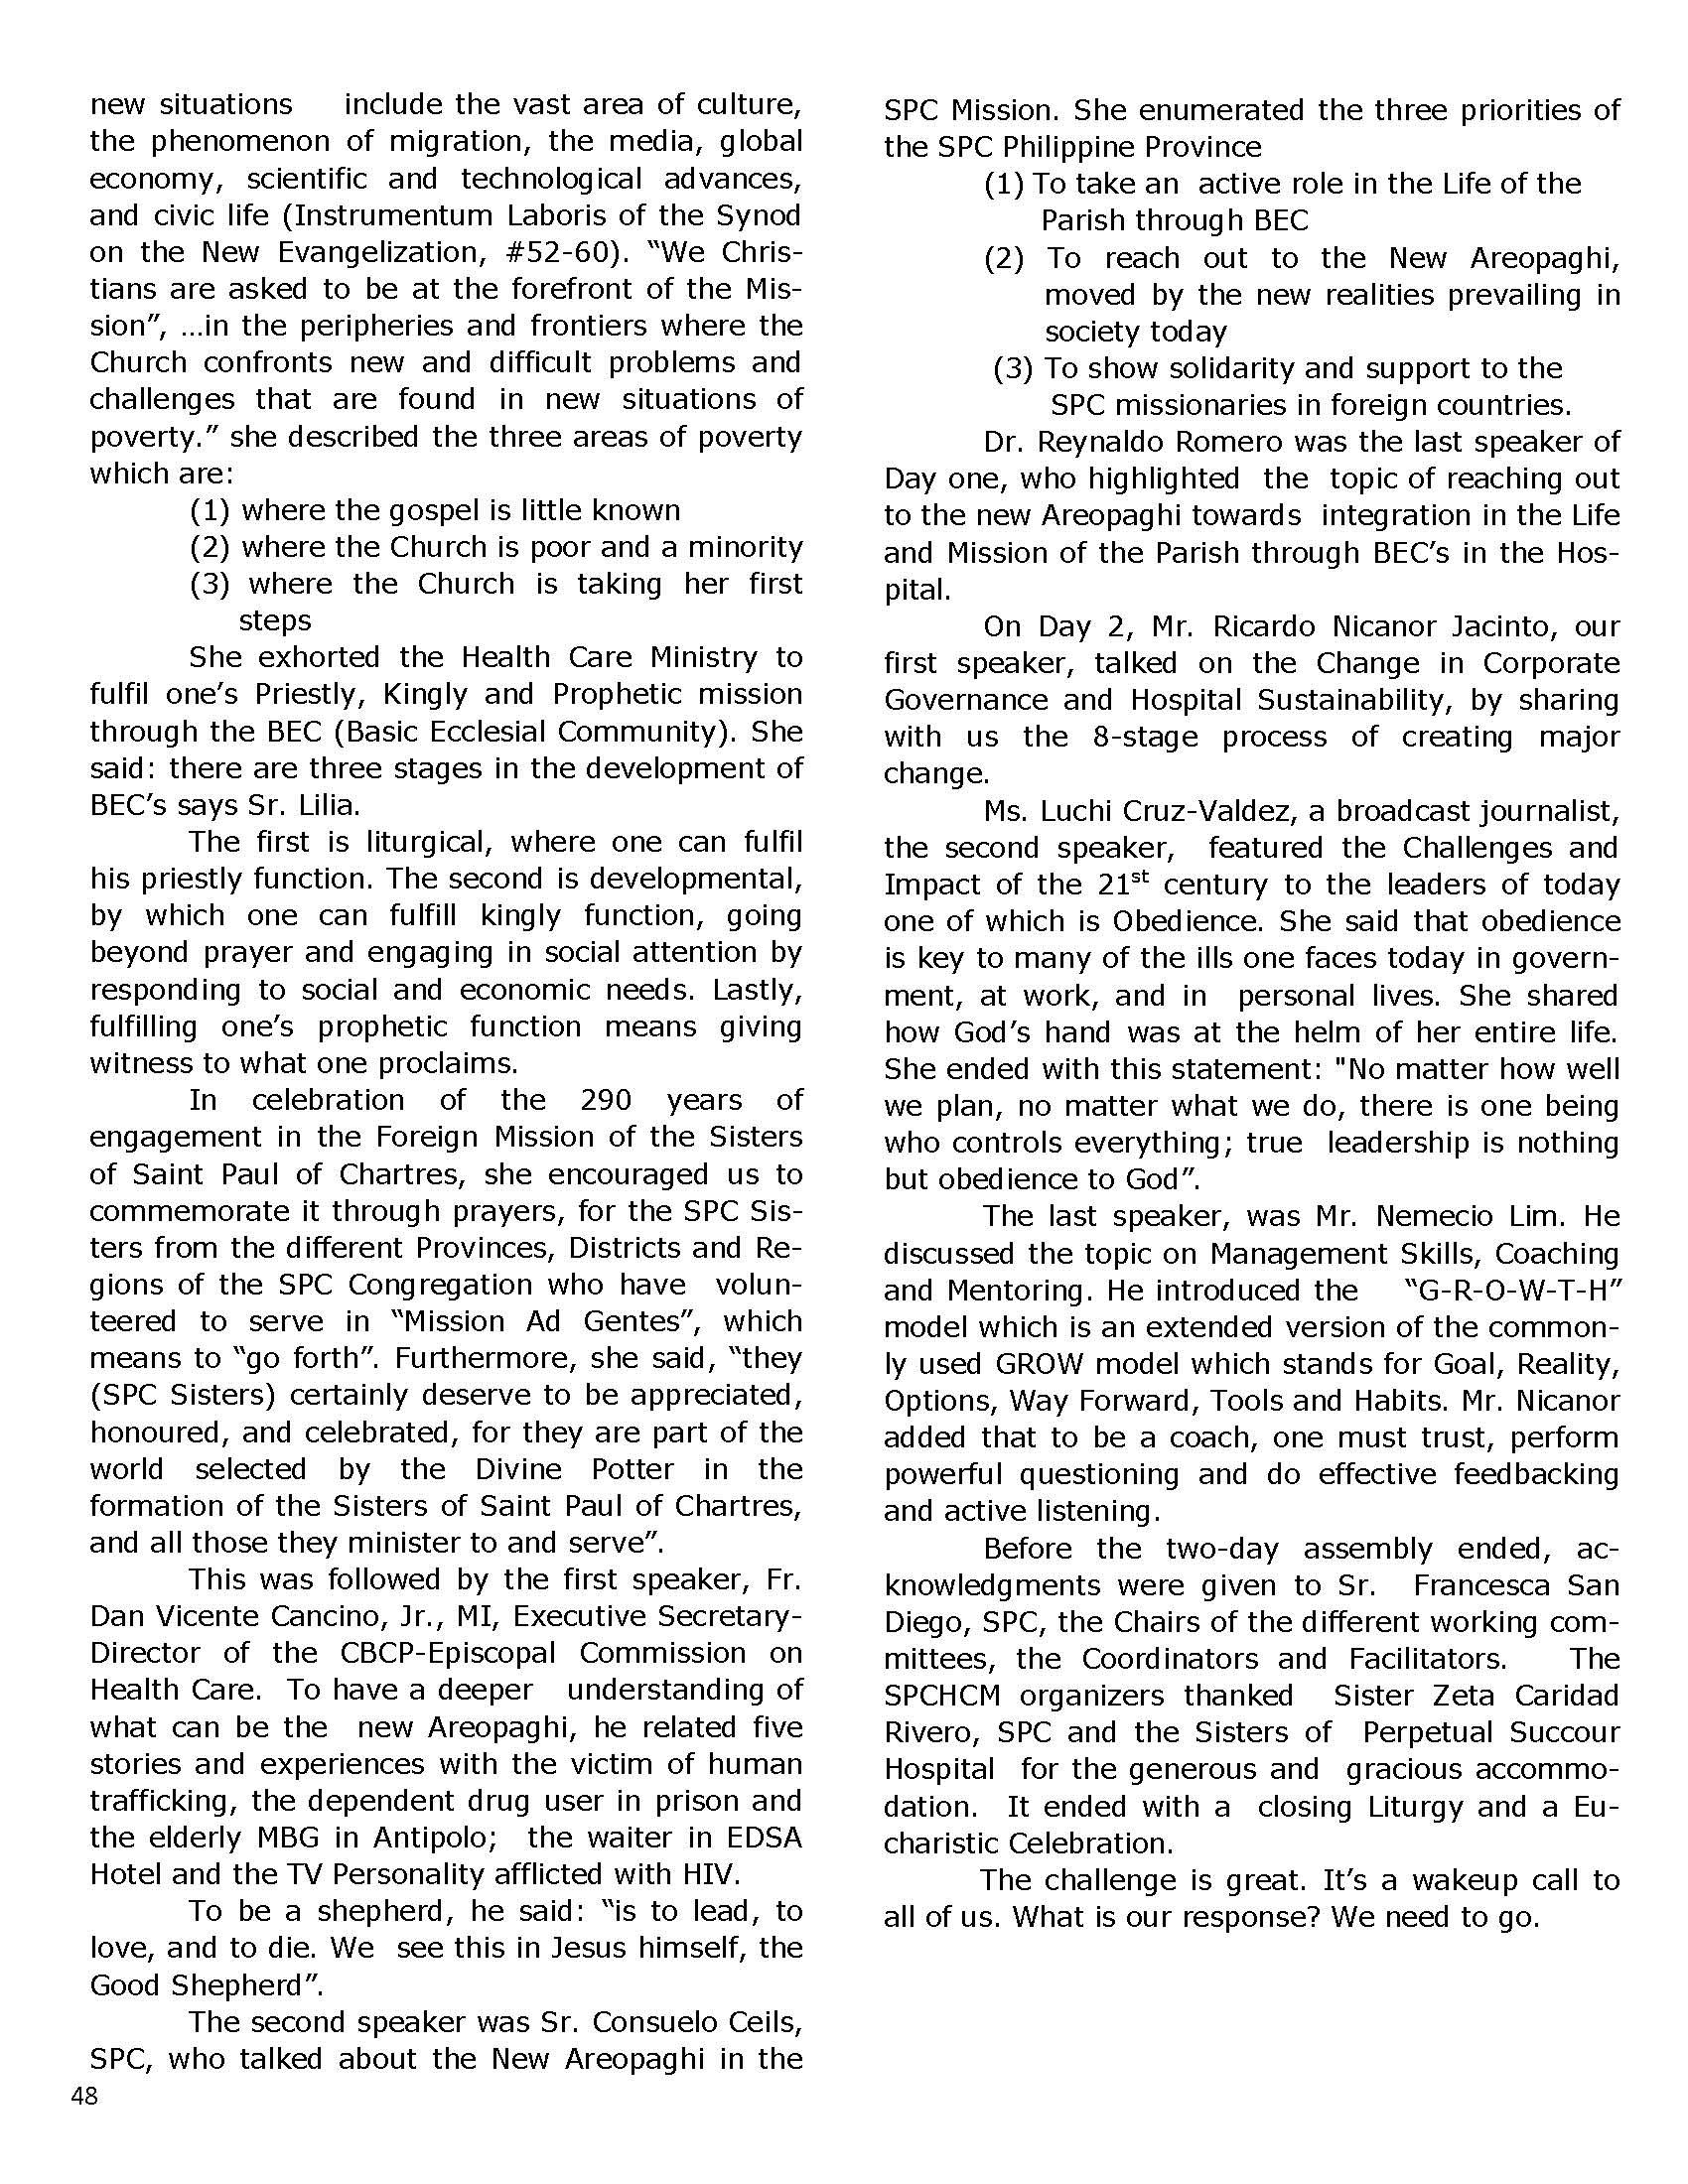 FINAL_TRAILBLAZER_volume 3_part1.pub2.pub_December5a_Page_42